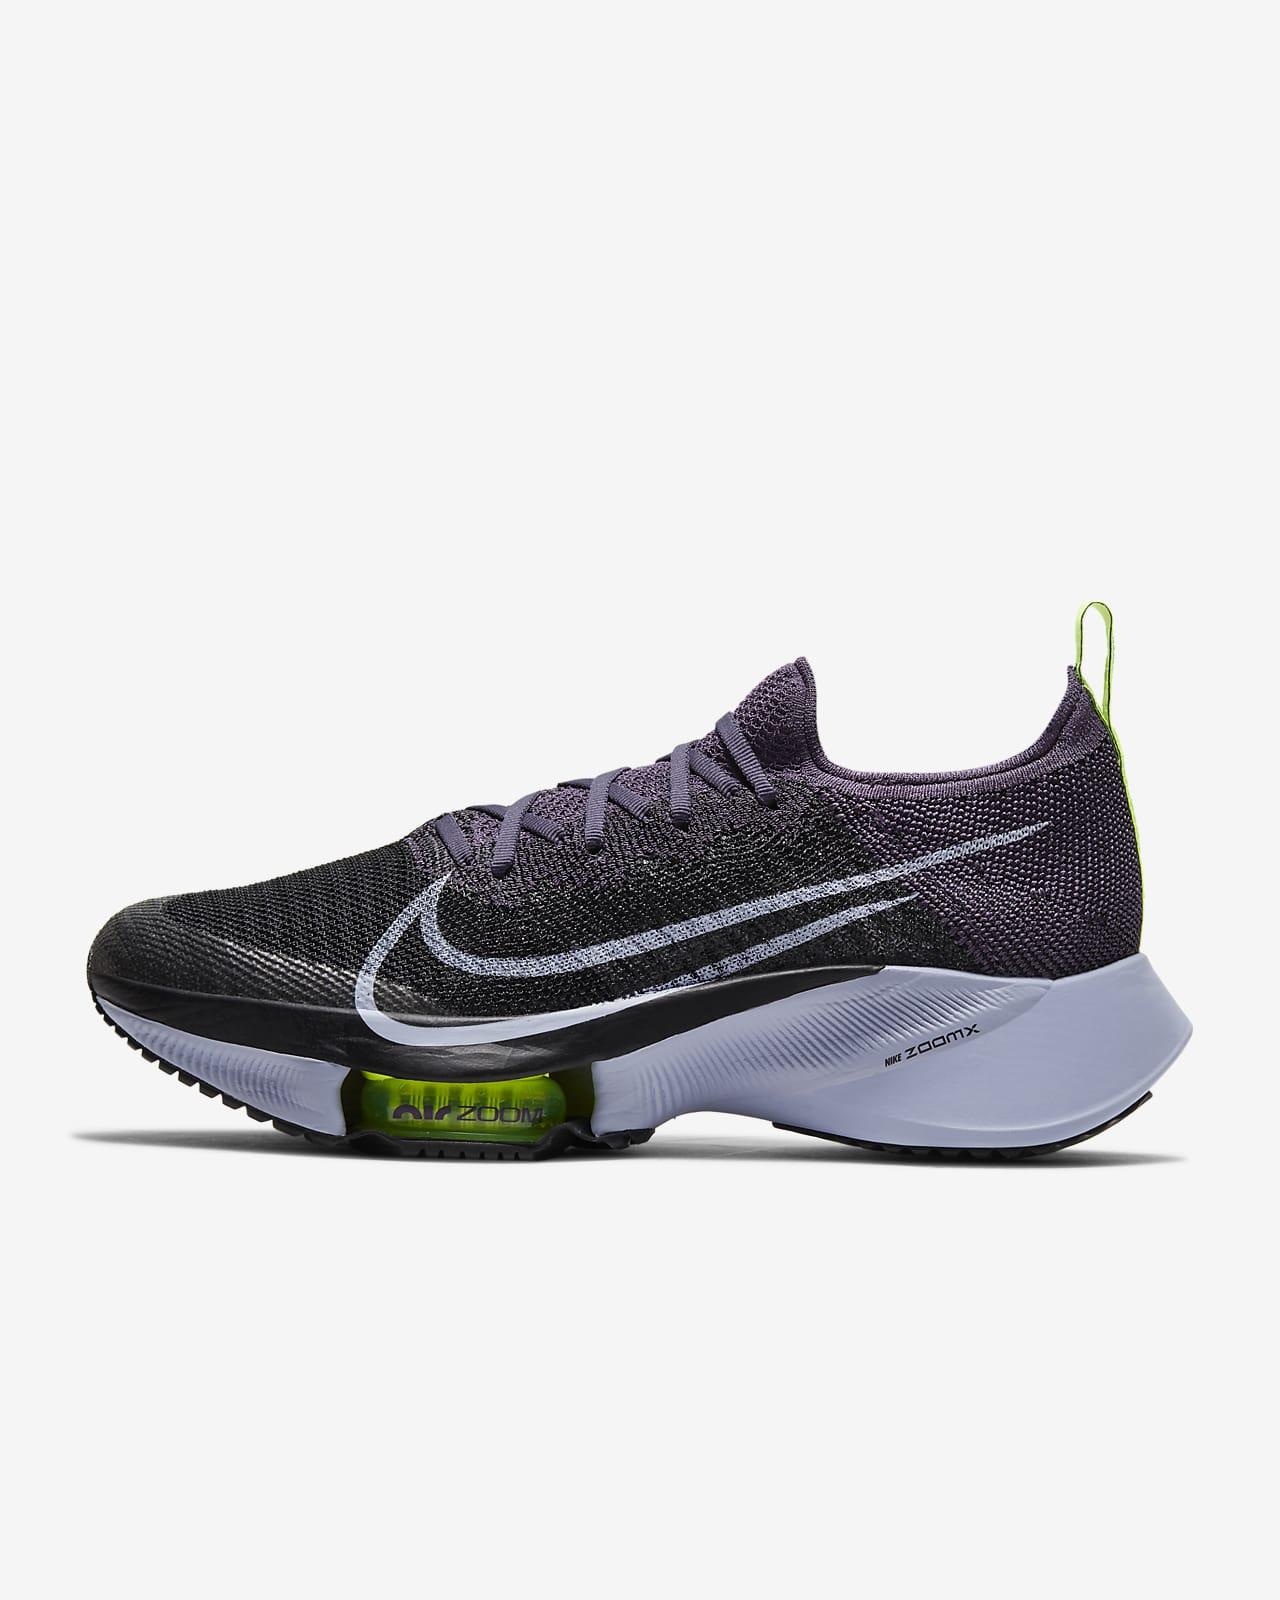 Damskie Buty Do Biegania Nike Air Zoom Tempo Next Nike Pl